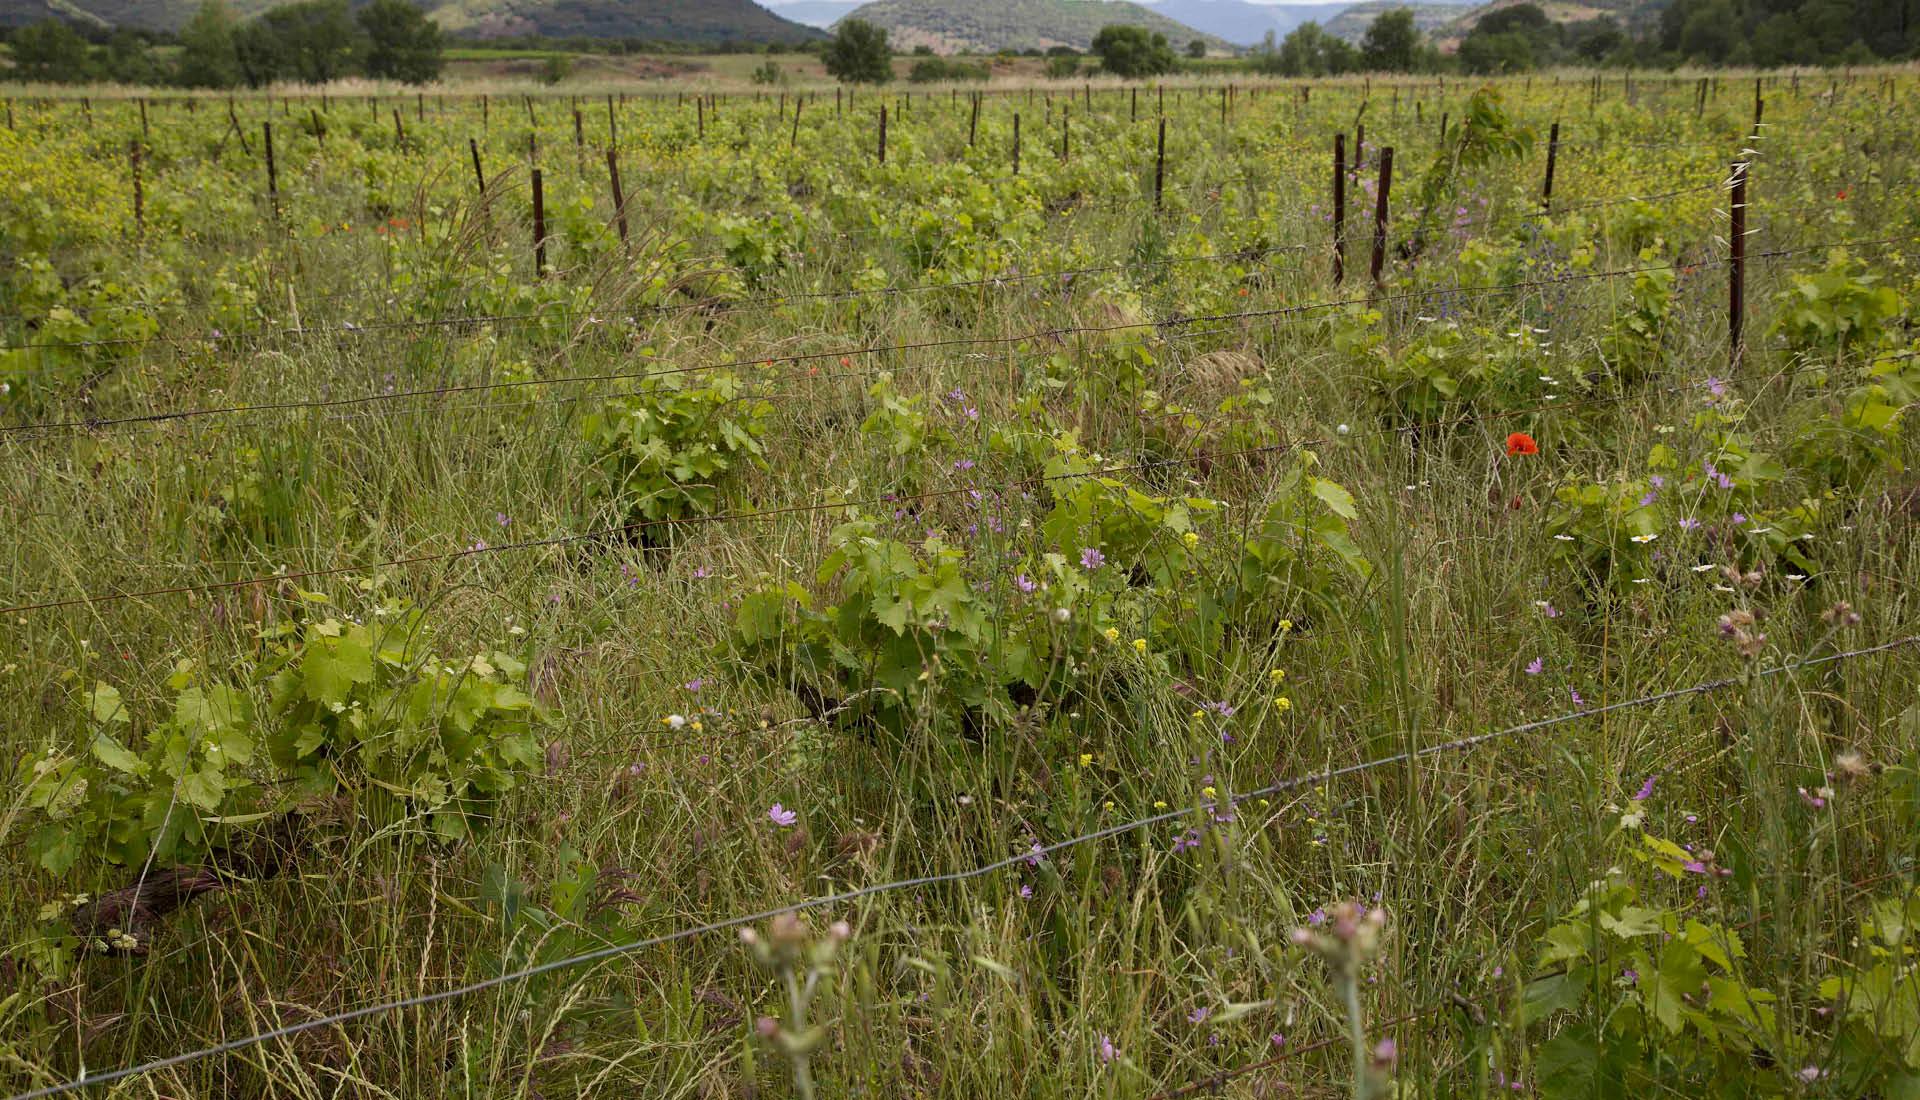 Cultures viticoles Grand Site Salagou © L.Micola 2